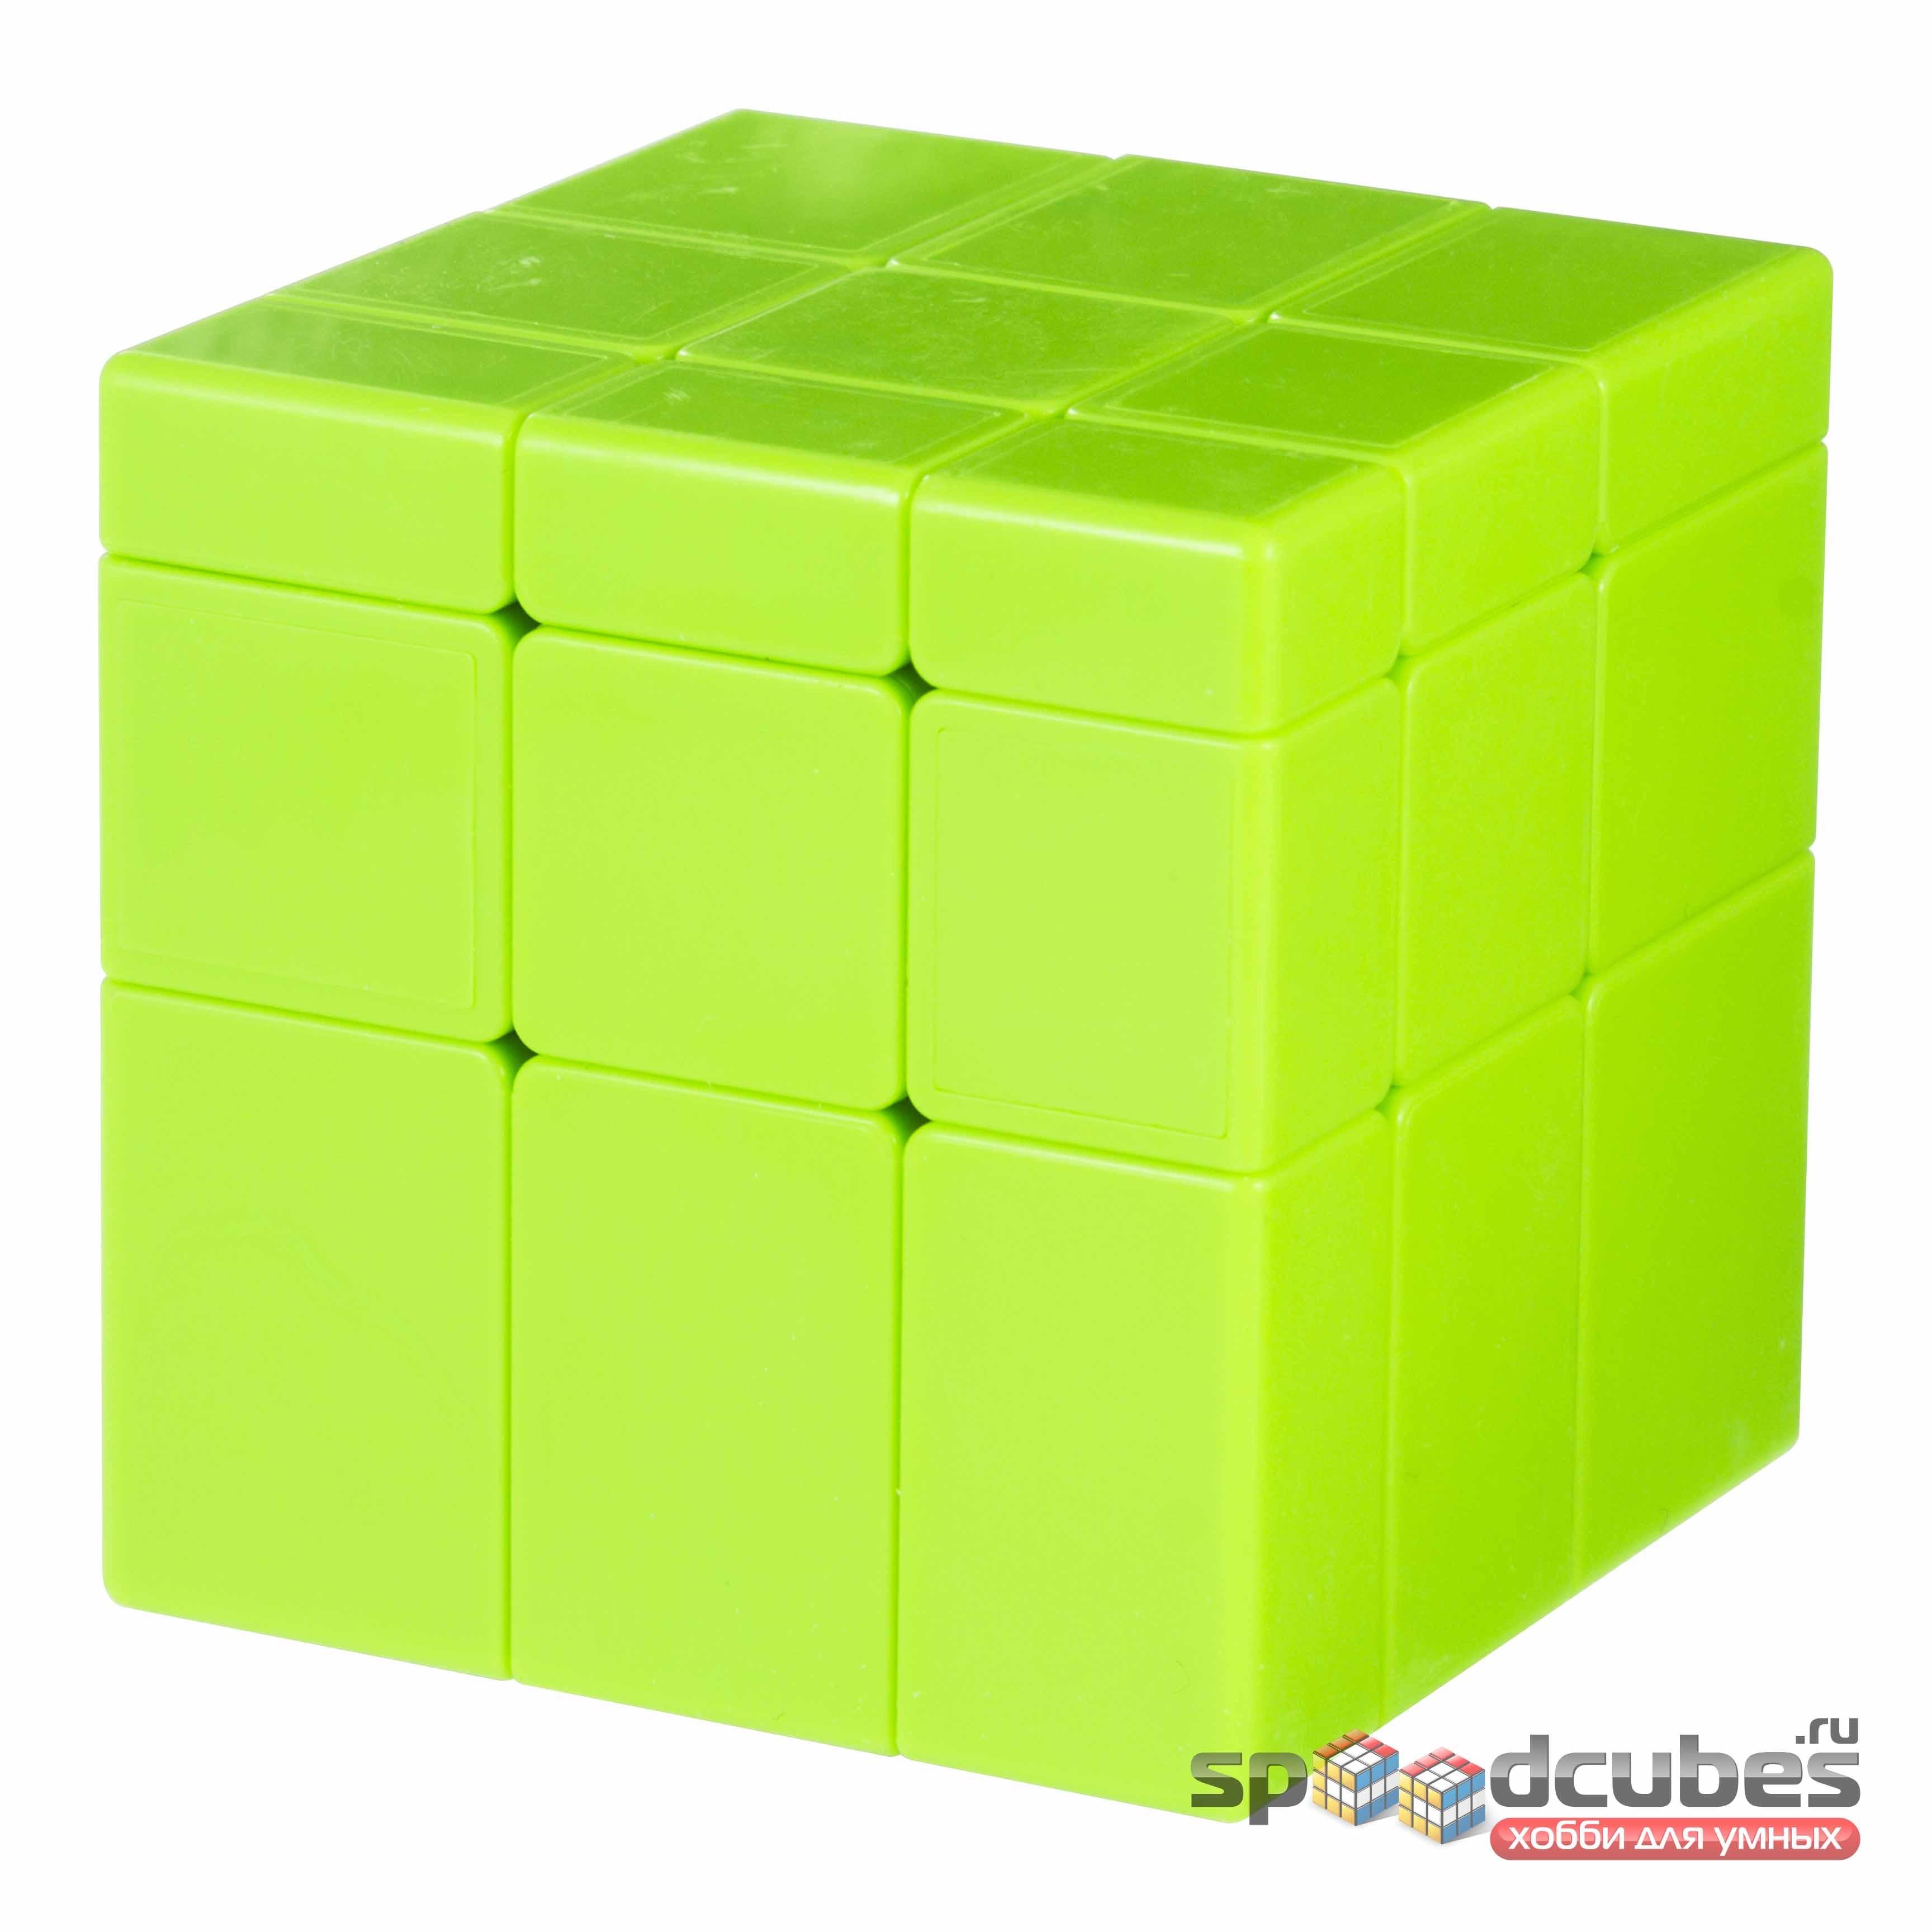 QiYi MoFangGe 3x3 Green Mirror Cube 2